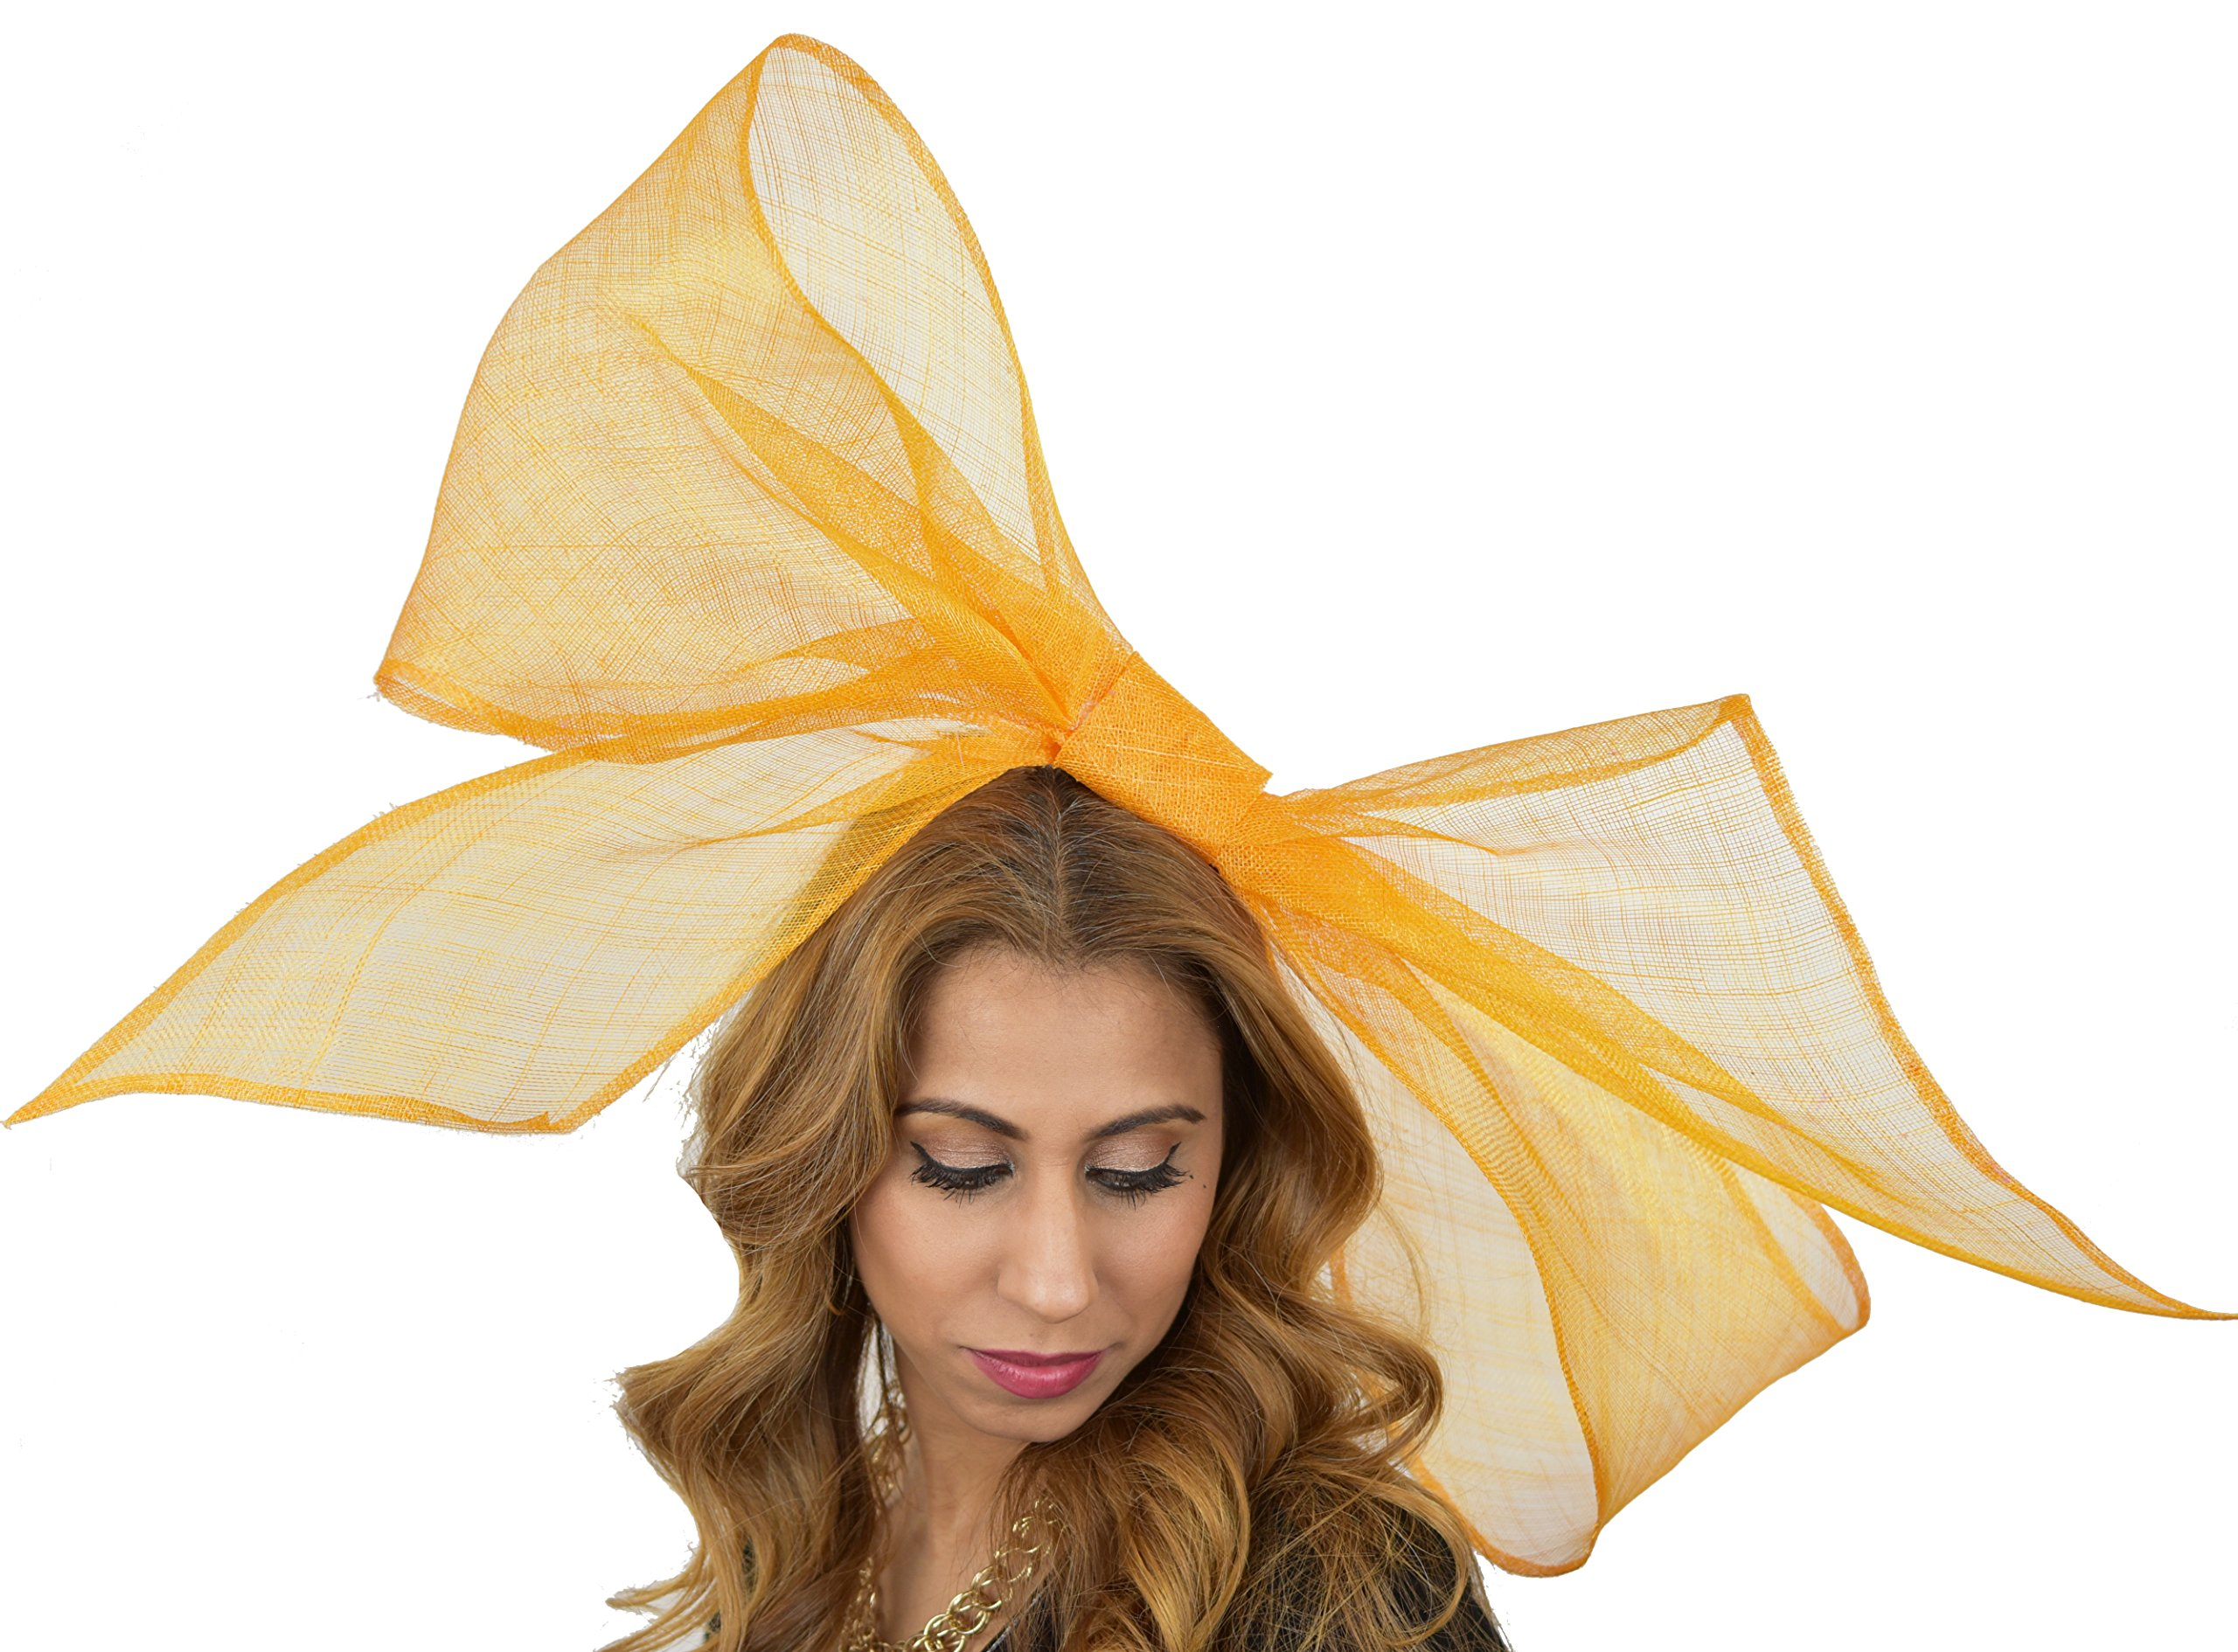 Hats By Cressida Ladies Large Wedding Races Ascot Derby Fascinator Headband Orange by Hats By Cressida